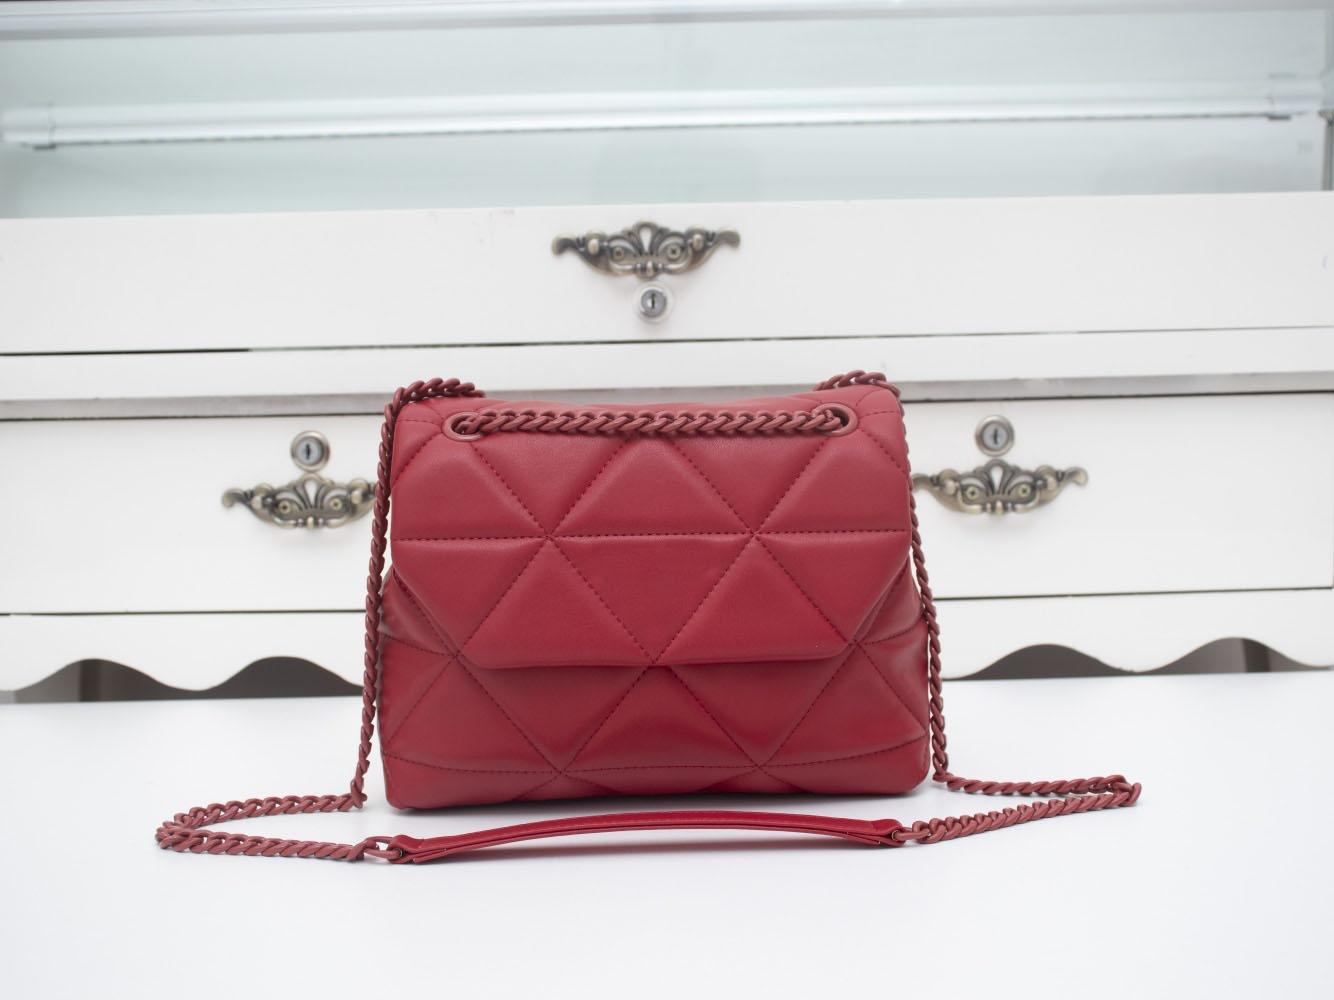 2021 Embrague PR12 Hombro Hot Hombro Mujer Monederos High Purse Designers Moda Bolsos Tote Crossbody Luxury Shopping Handbag Calidad Flower UFSRF